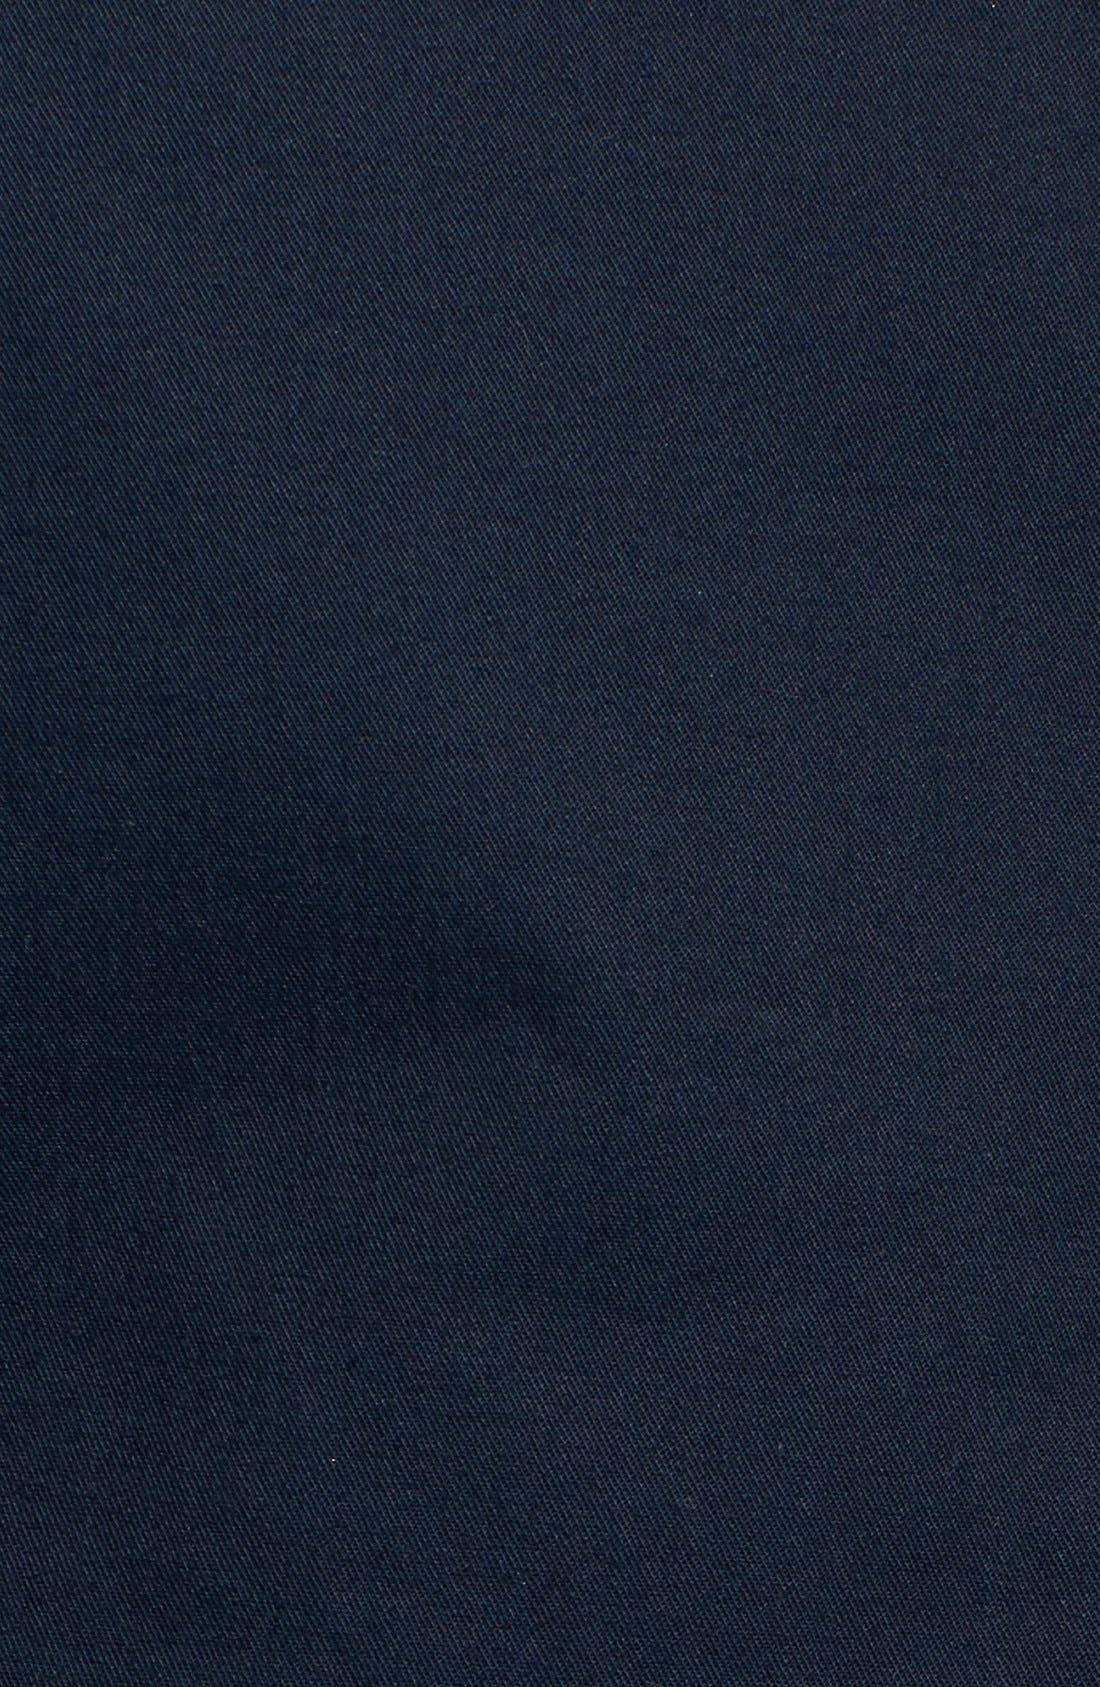 'P55' Harrington Jacket,                             Alternate thumbnail 2, color,                             413